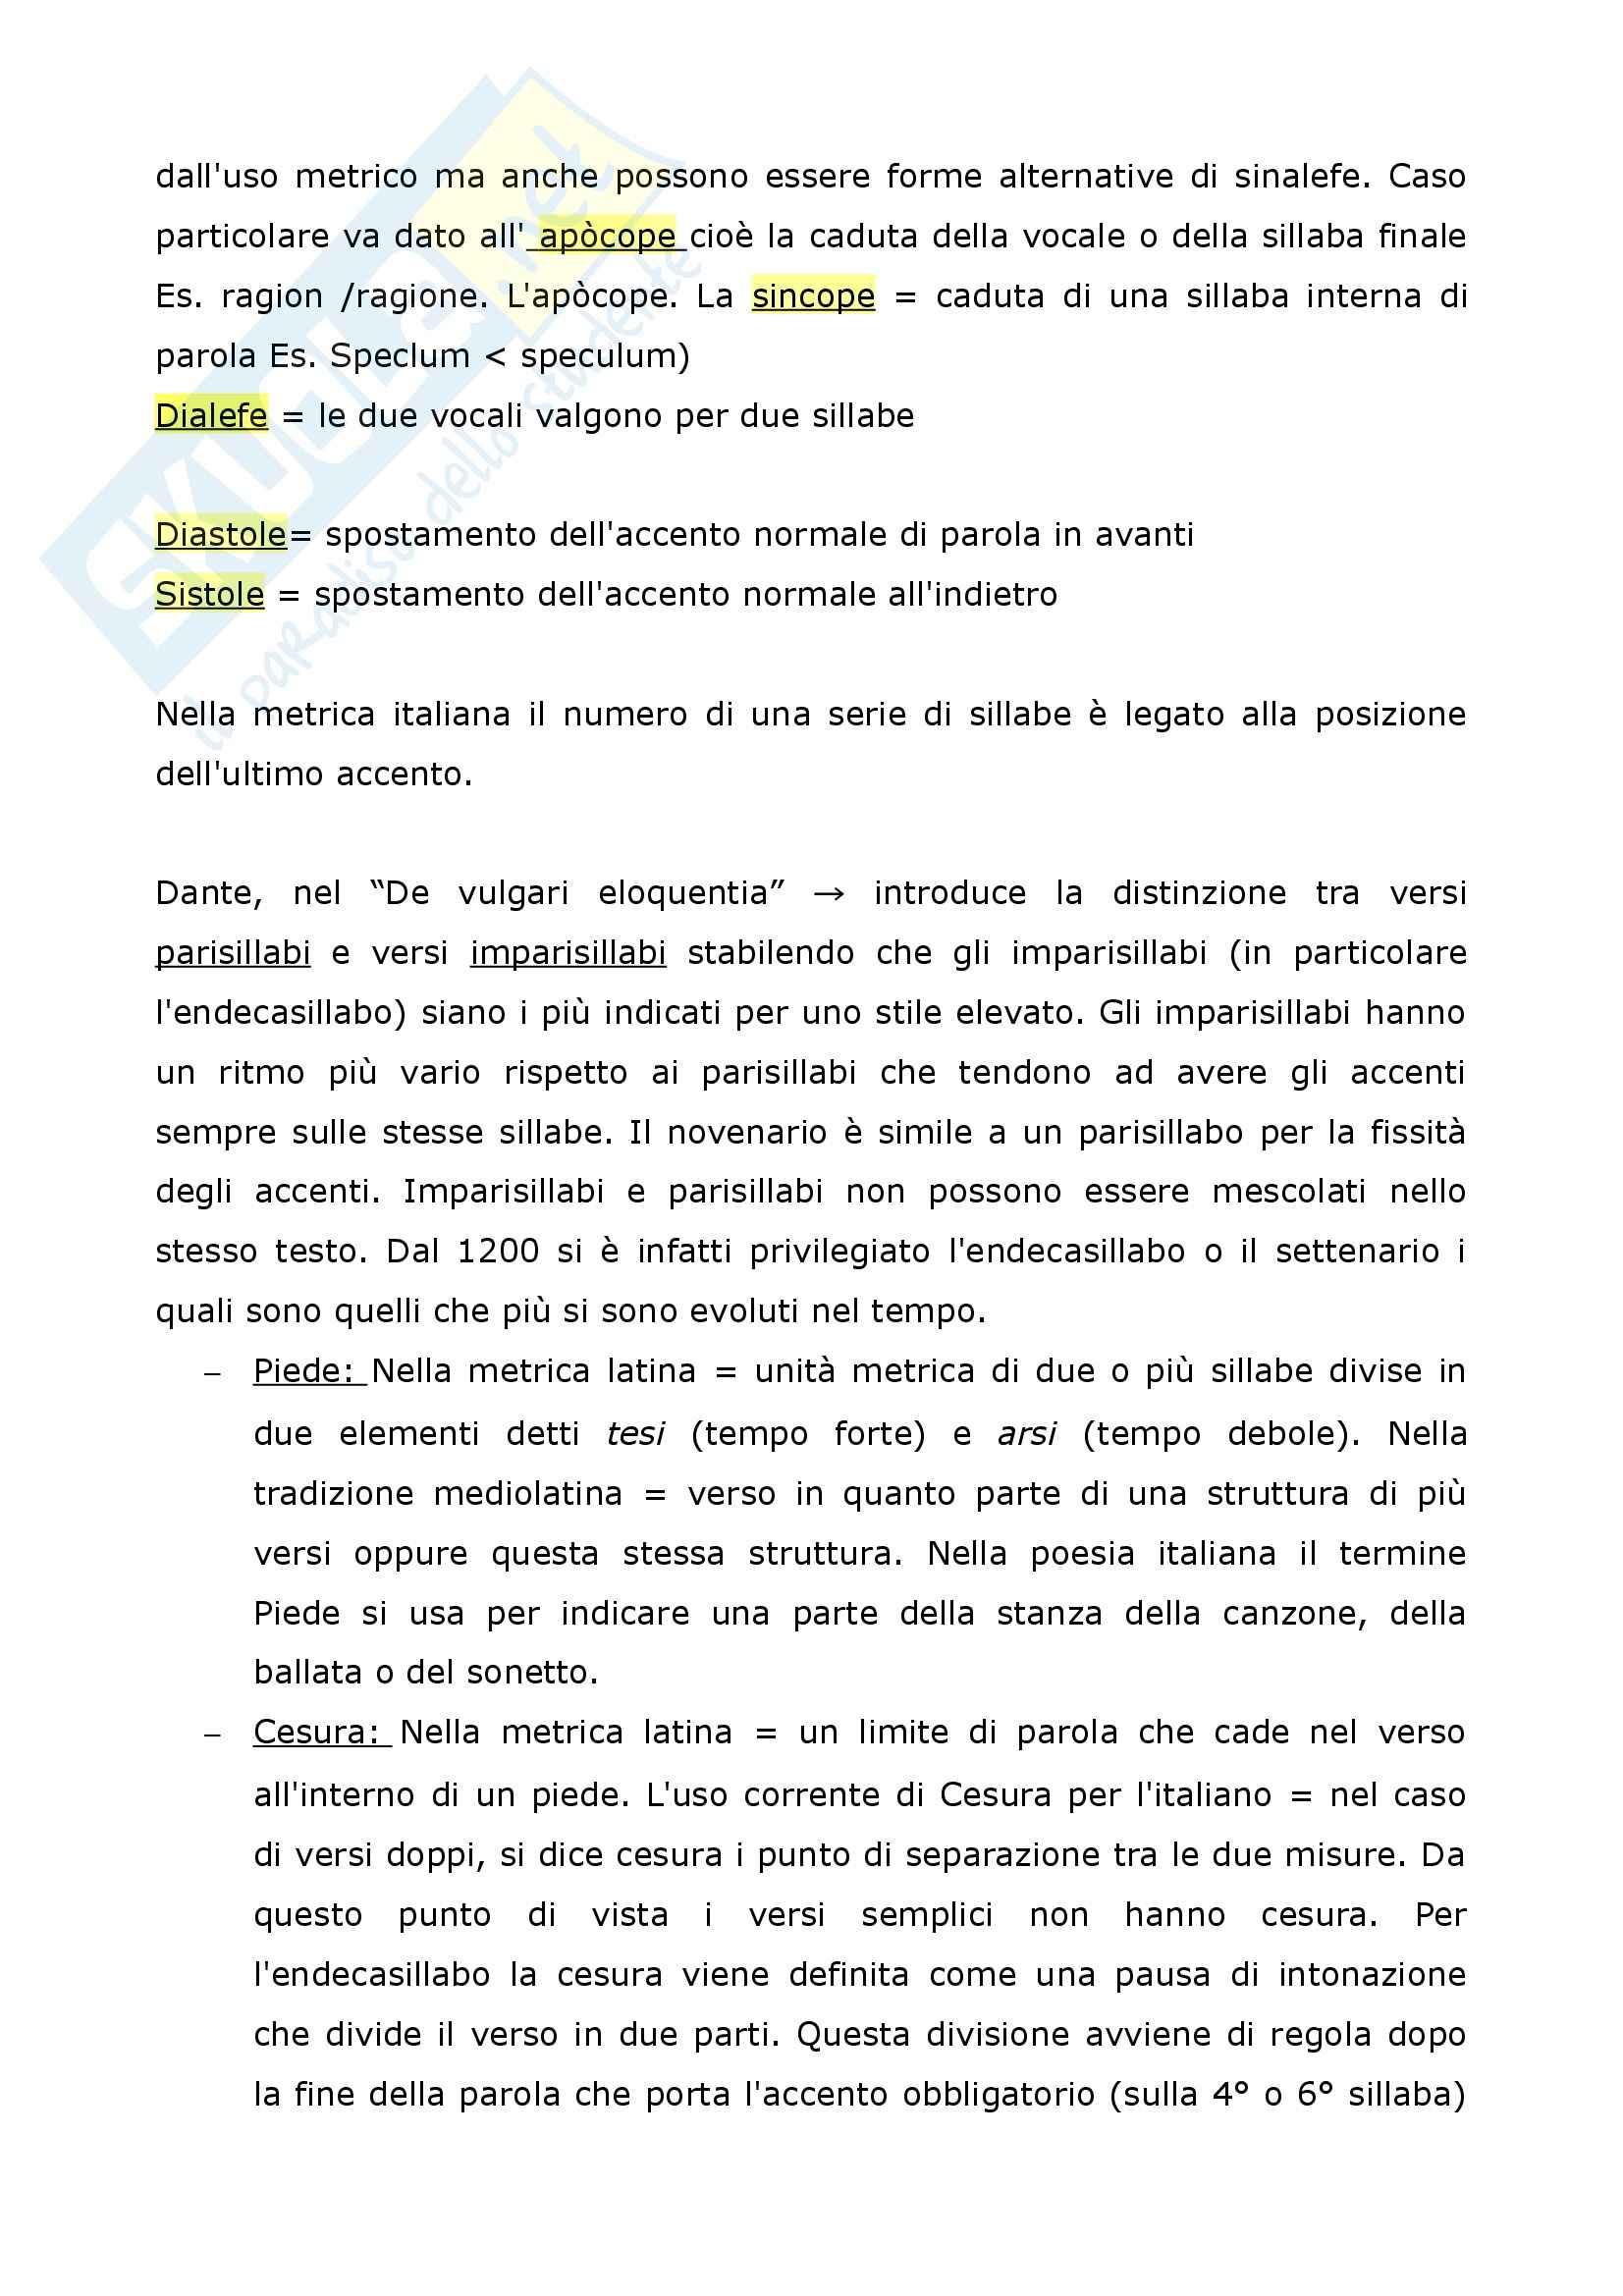 Riassunto esame Filologia italiana, La Metrica italiana, Beltrami, prof. Pancheri Pag. 2